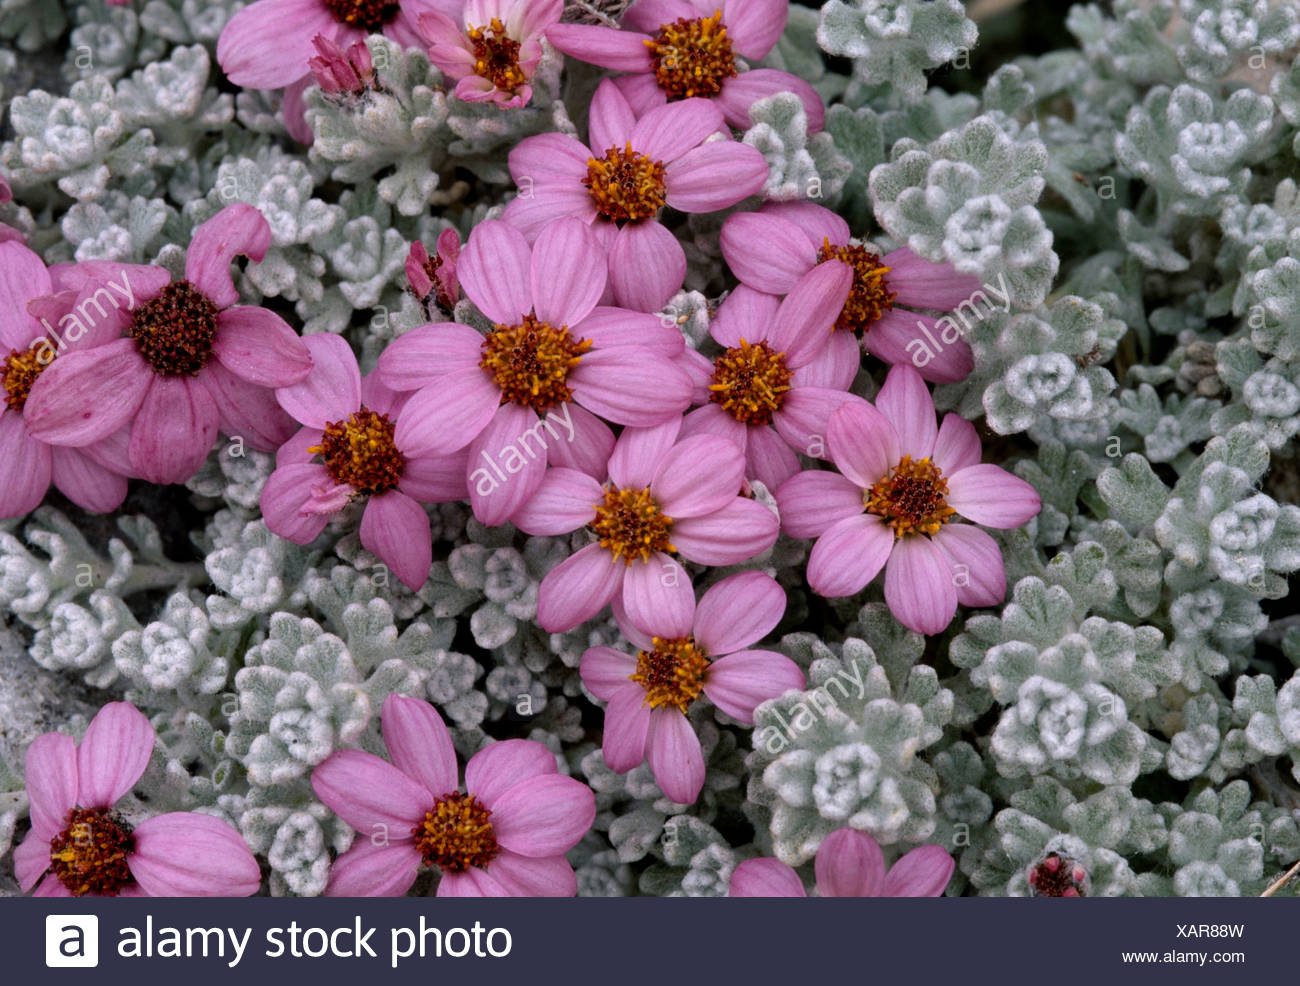 Flowers, Baltoro Glaciers, Paksitan - Stock Image